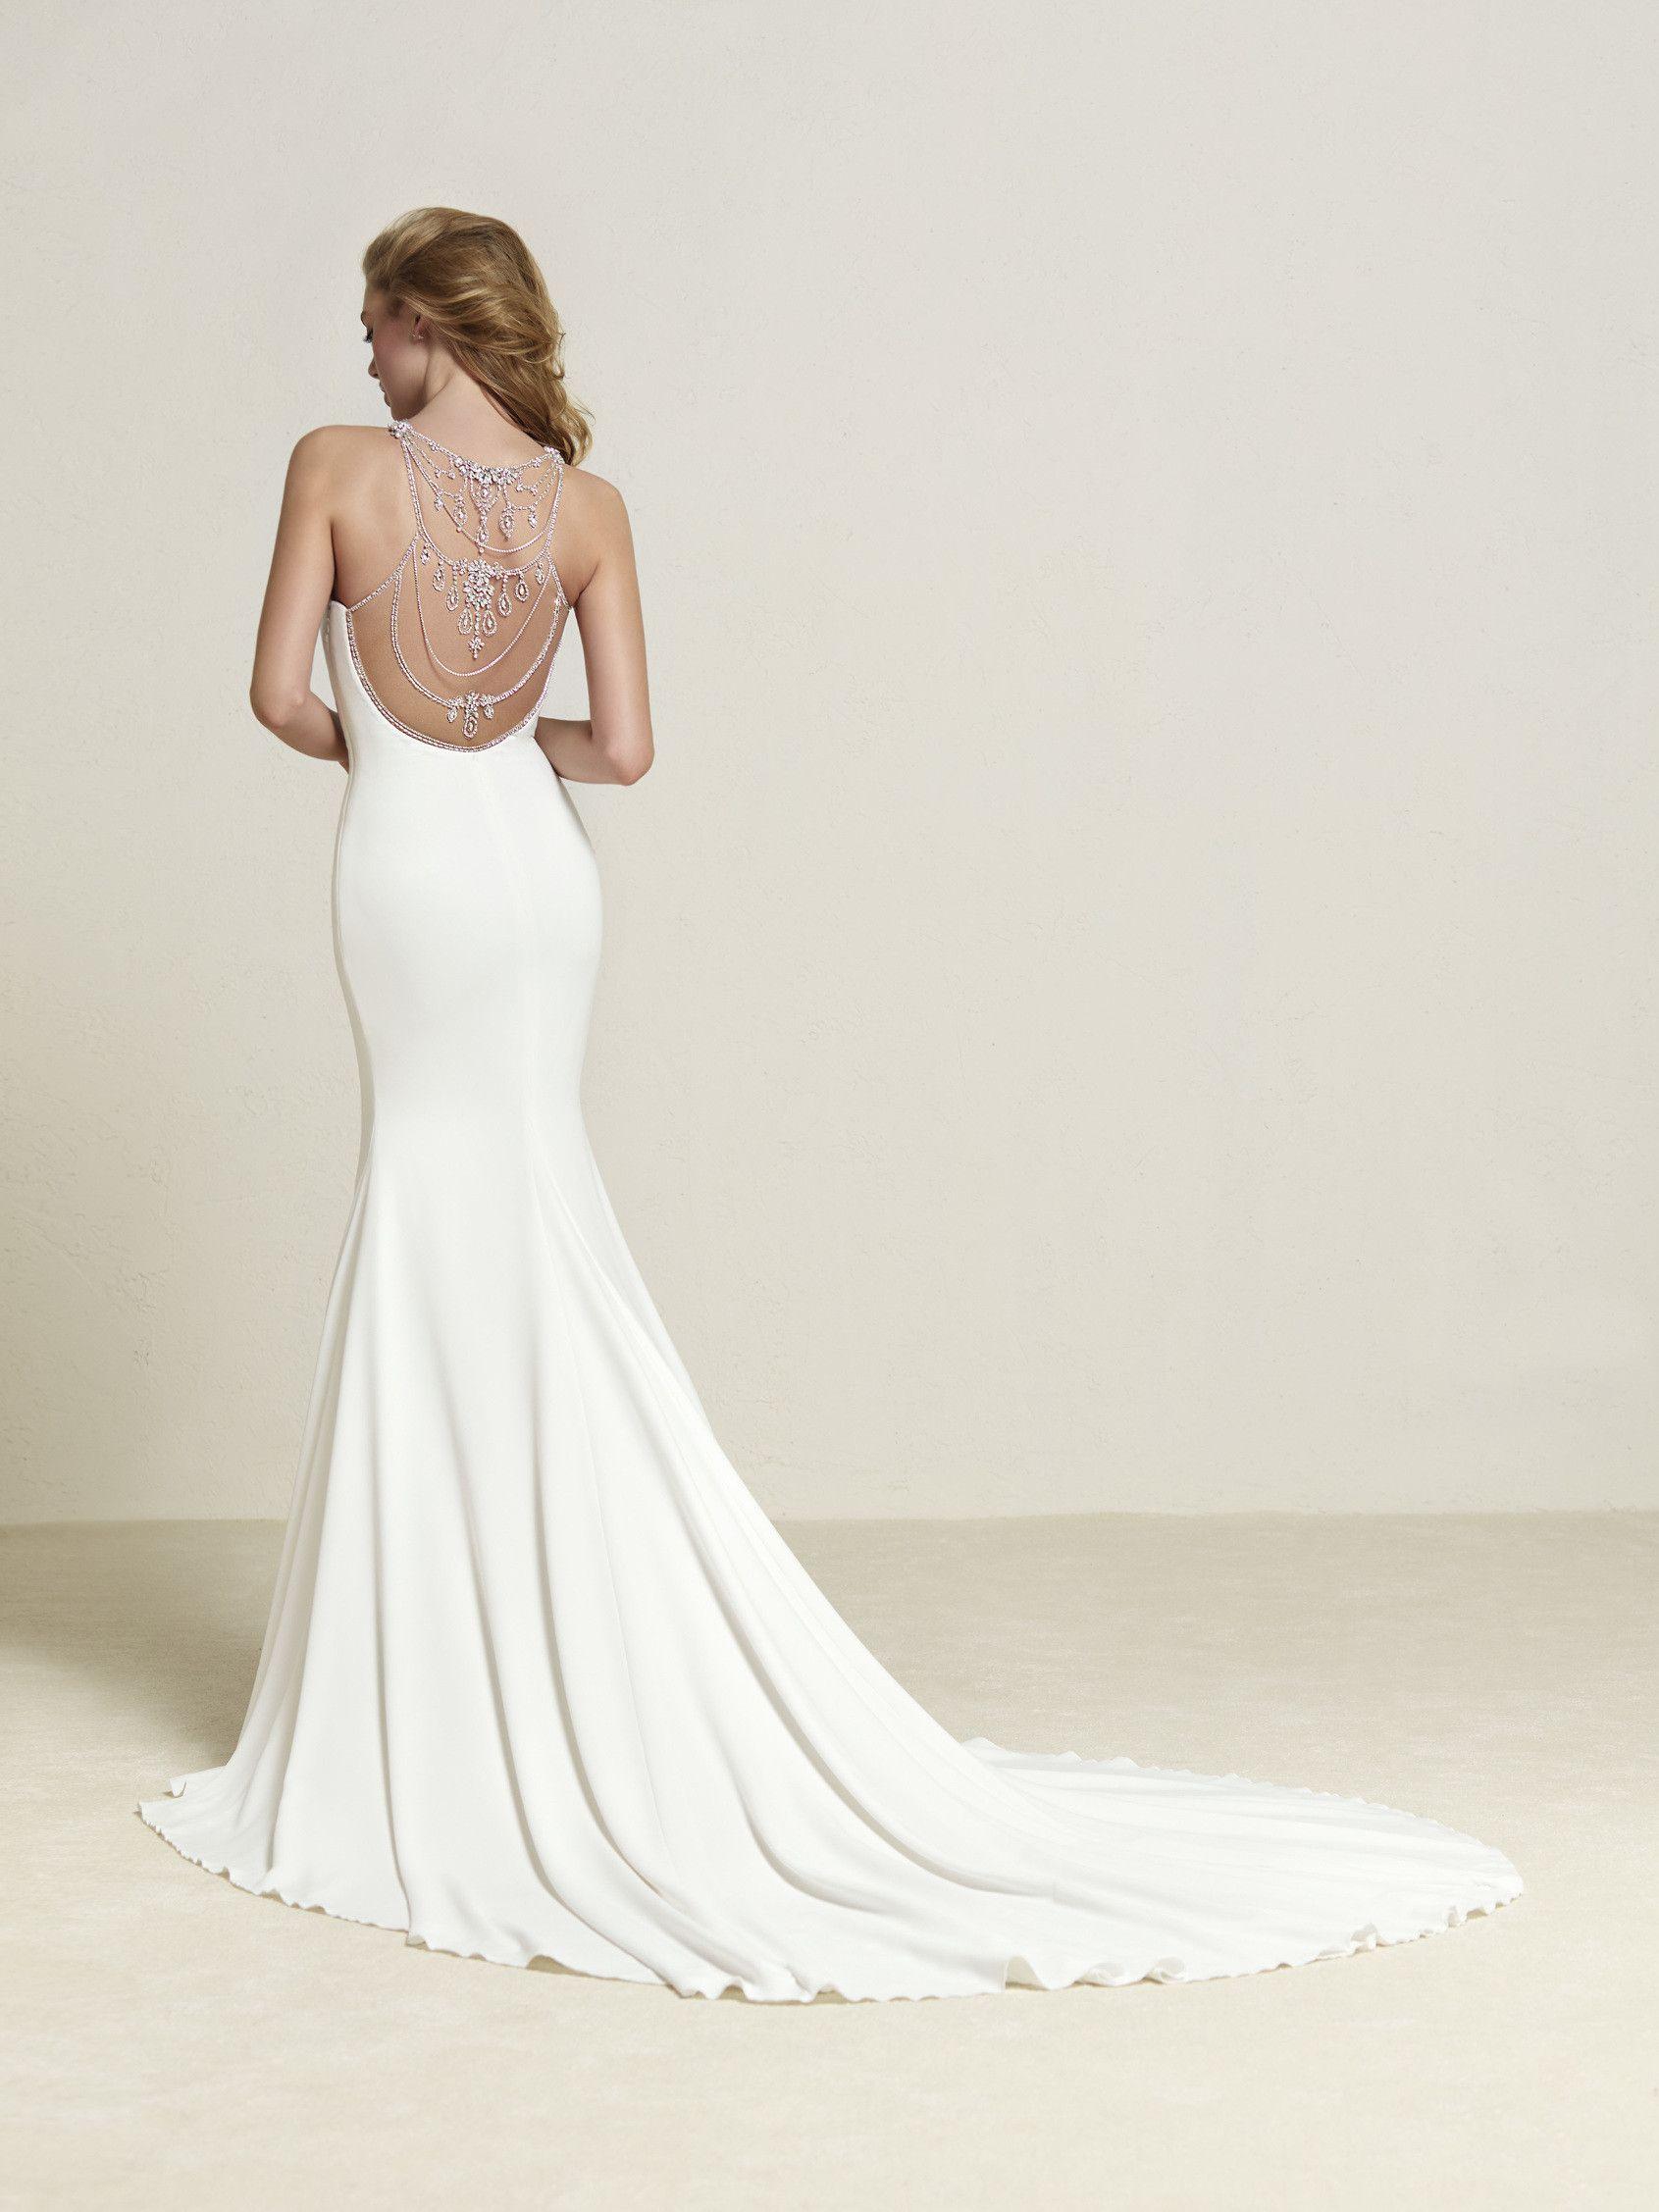 Mermaid wedding dress necklace | Wedding dress | Pinterest ...